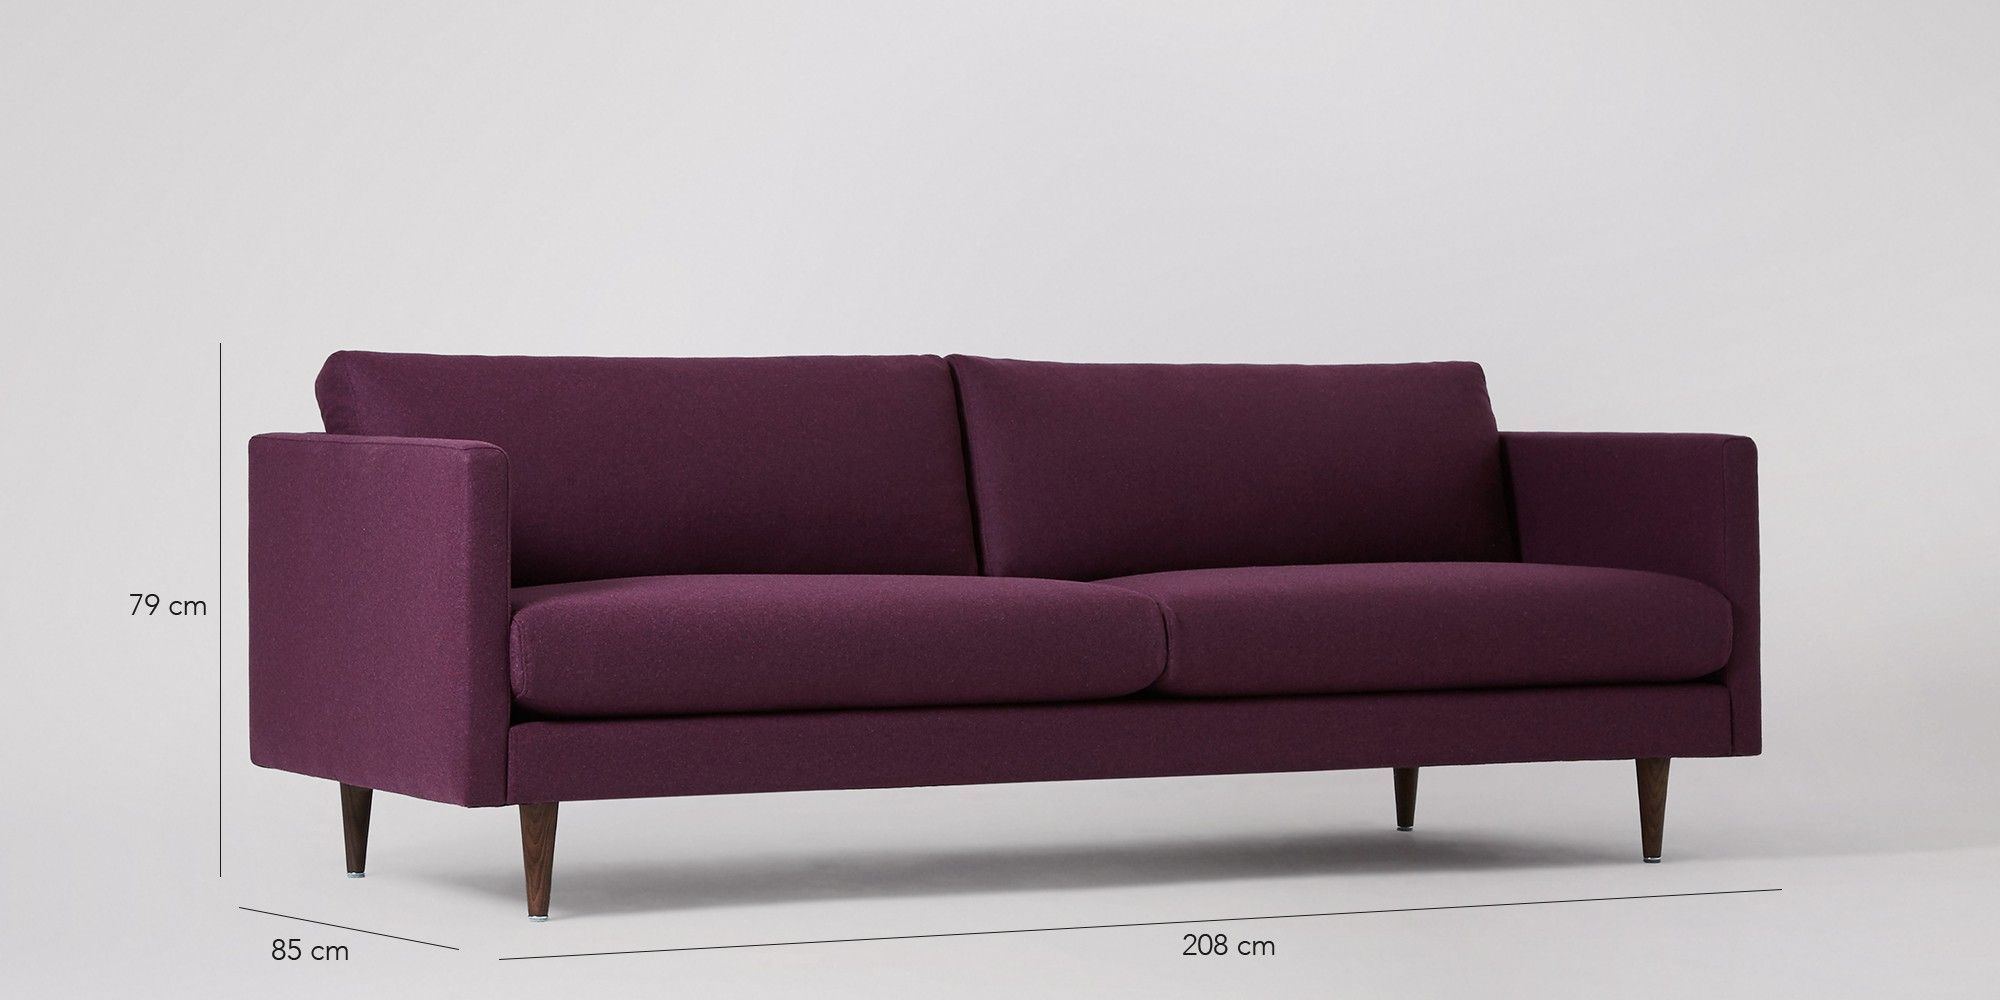 Buy Sofa Uk Euro Moorabbin Tivoli Sofas 2017 Furniture Stores Near Me Pinterest Three Seater Swoon Editions 889